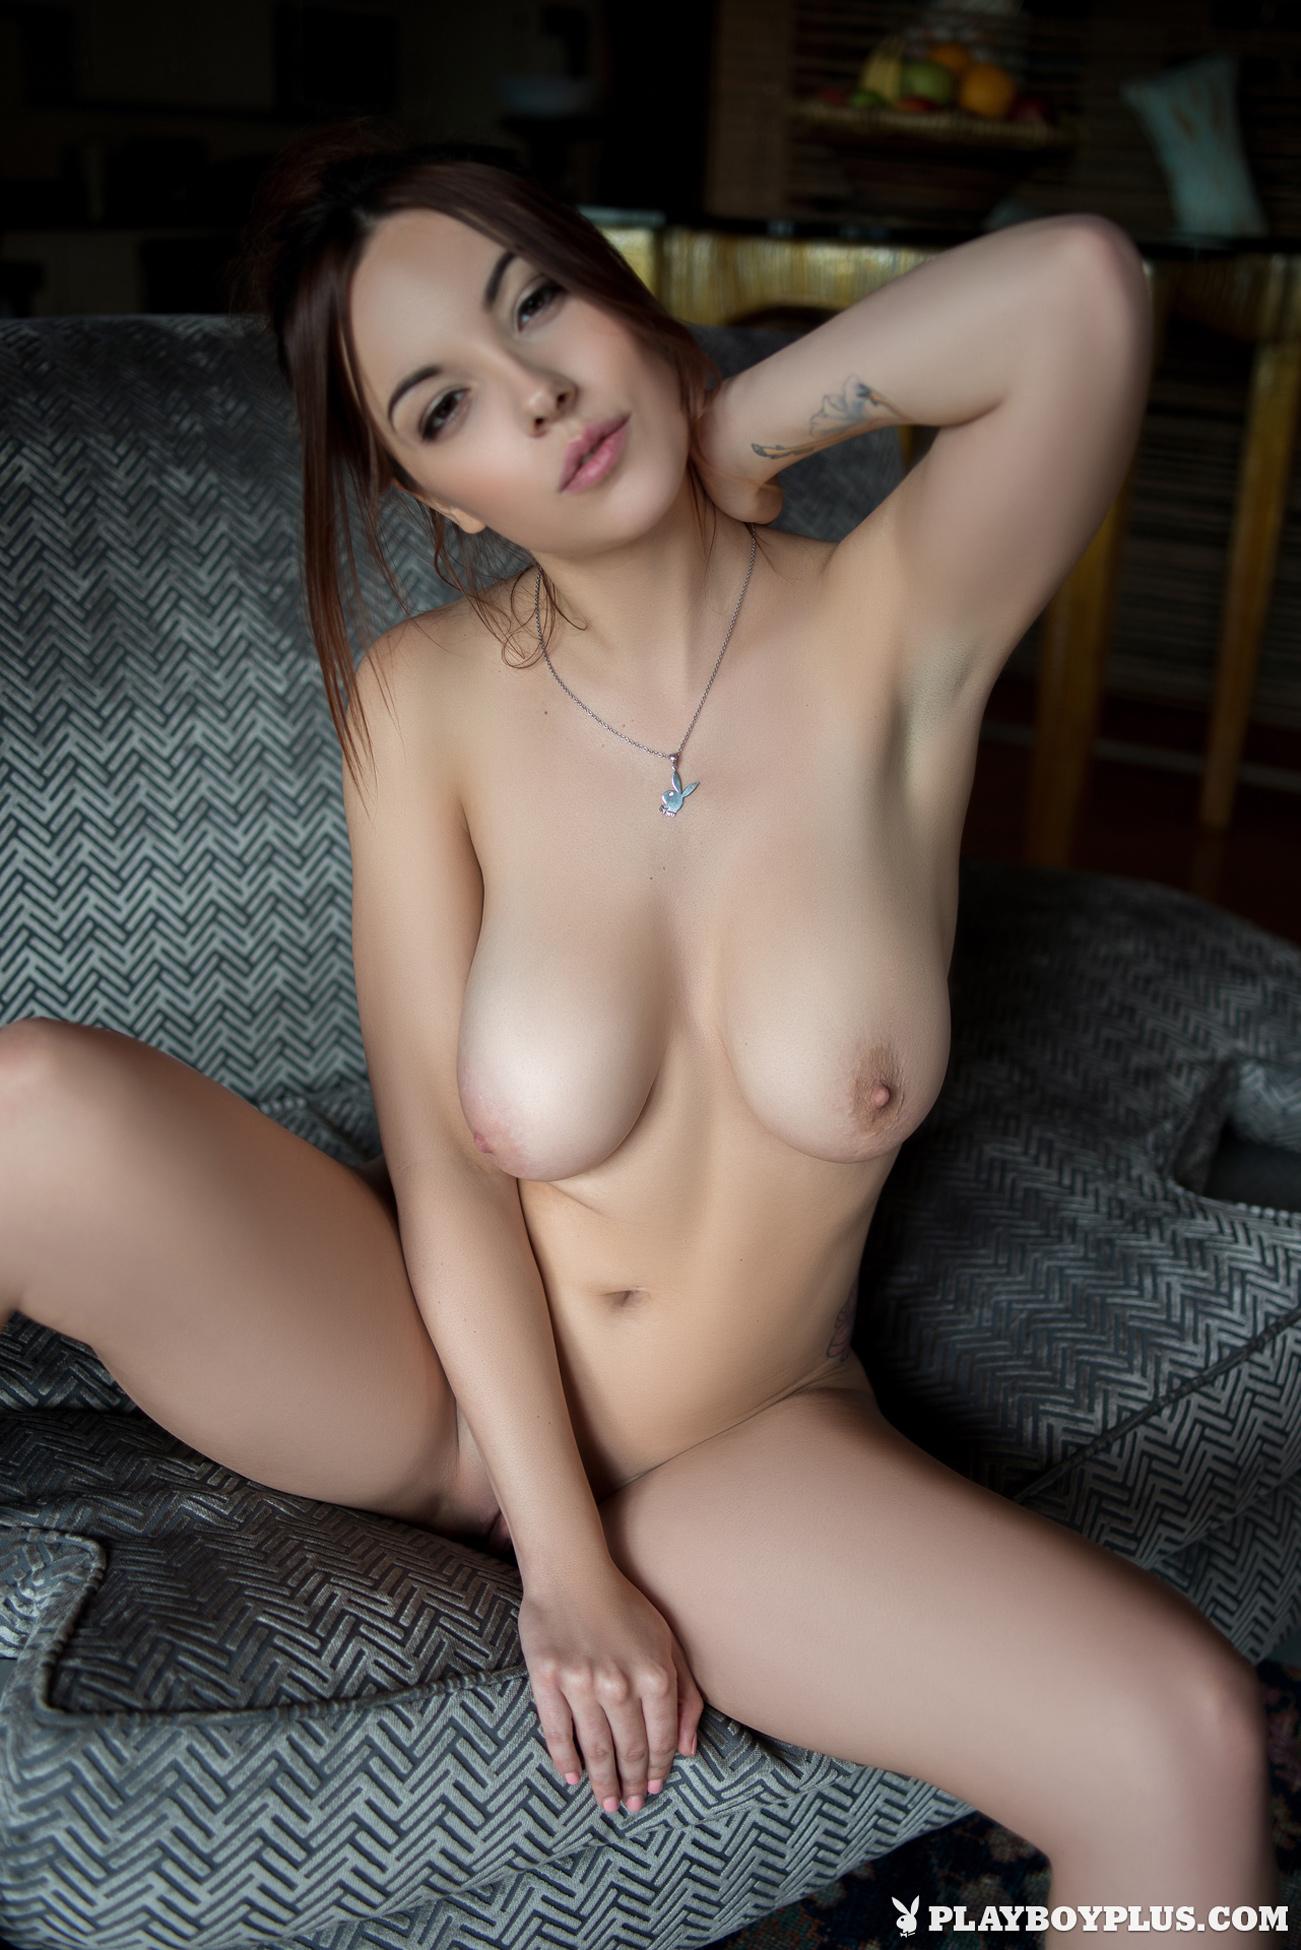 elizabeth-marxs-boobs-sofa-naked-playboy-18